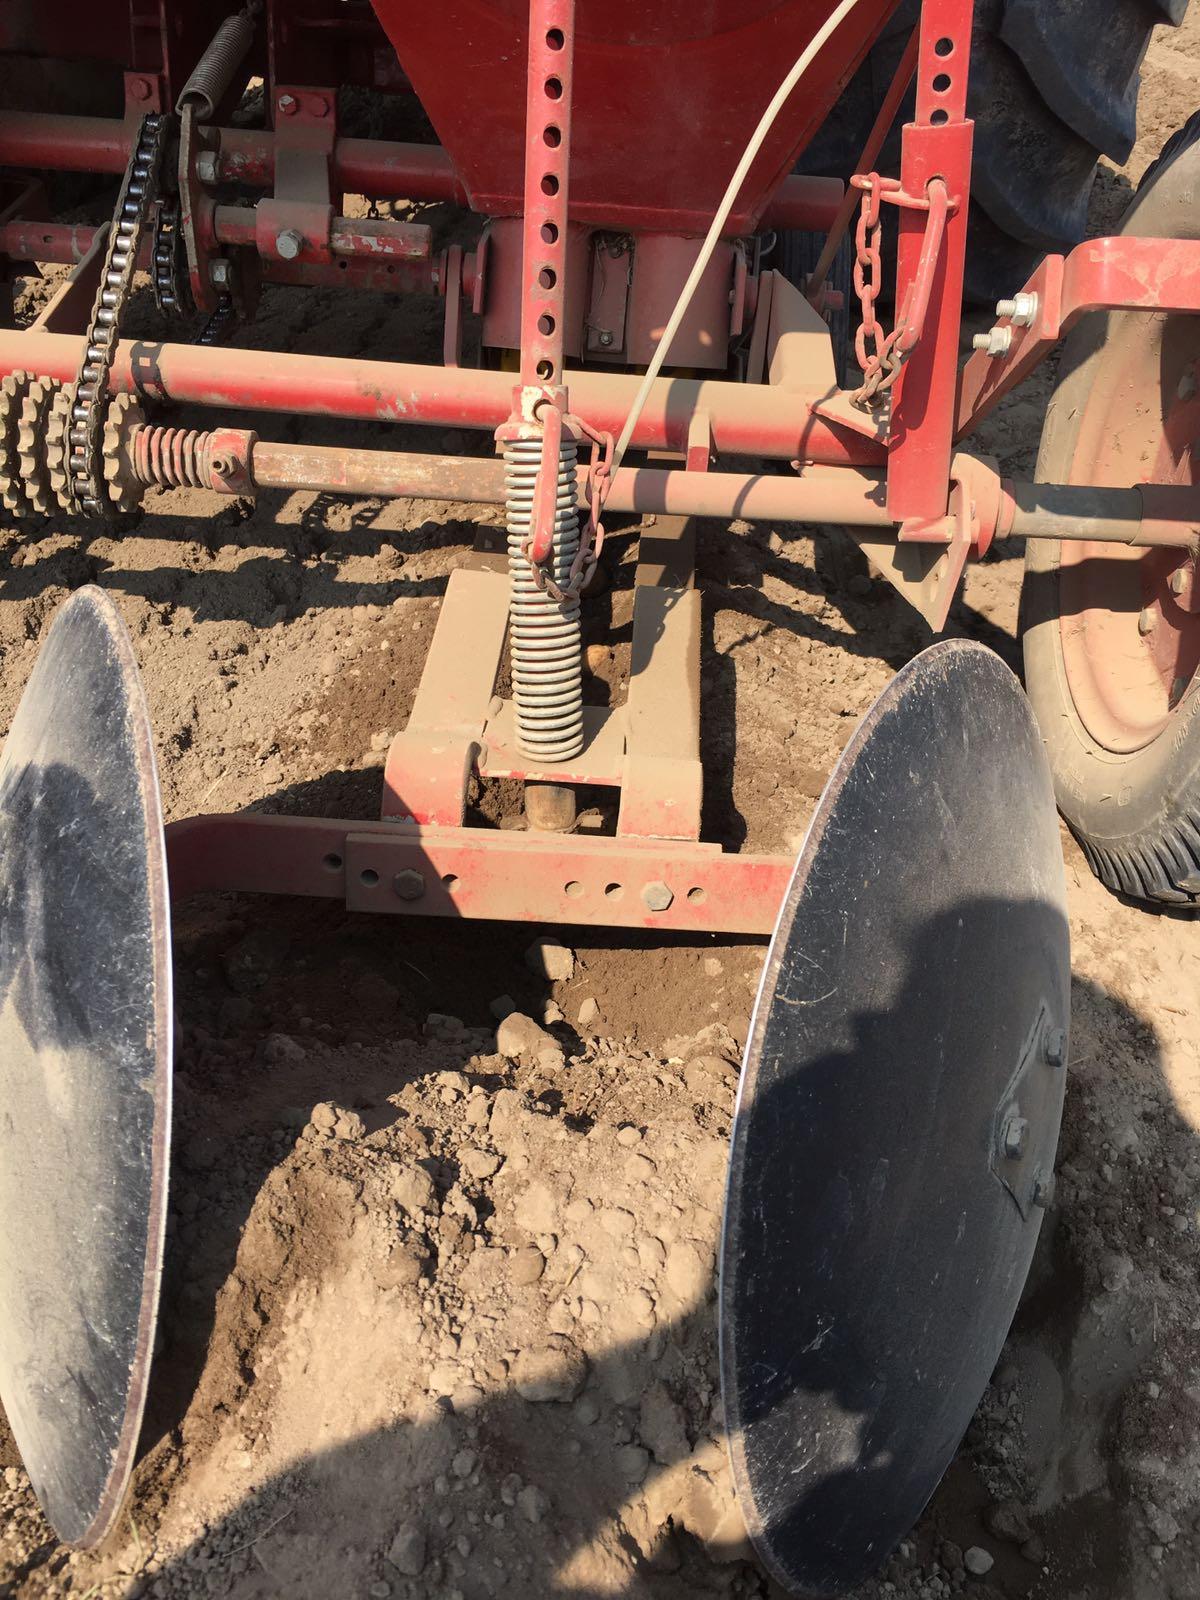 semina patate 28 marzo 2018 4